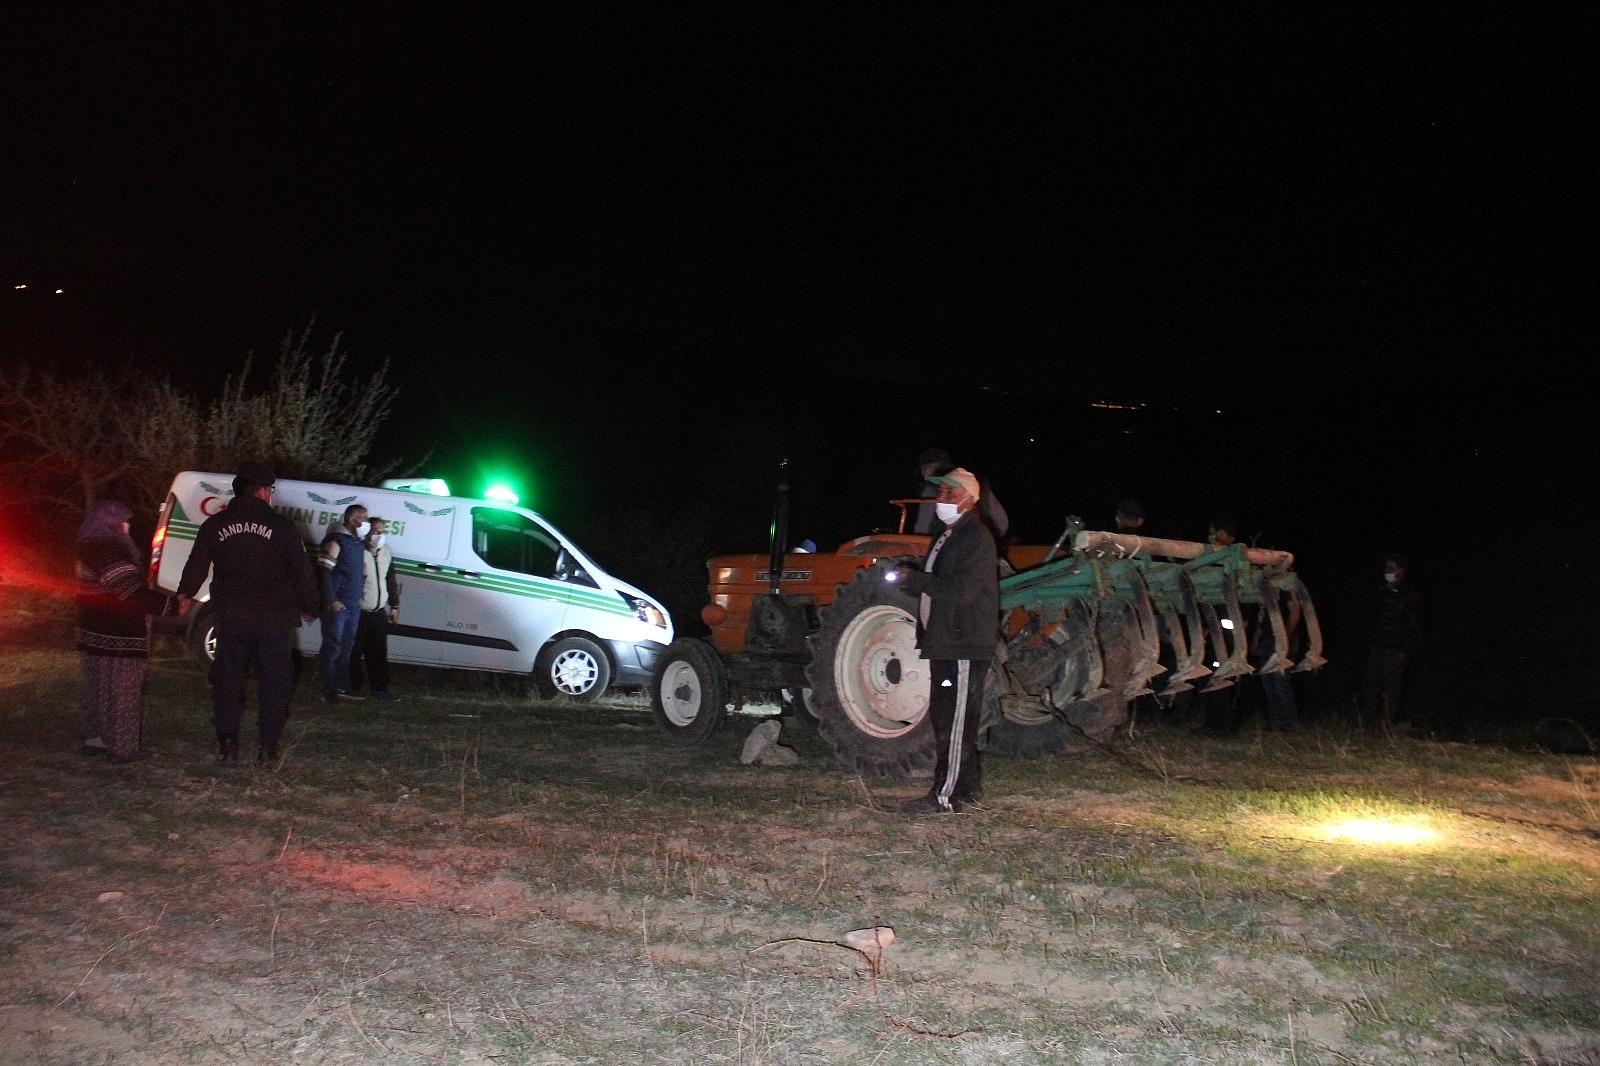 2021/04/karamanda-traktorun-altinda-kalan-ciftci-hayatini-kaybetti-20210421AW30-7.jpg